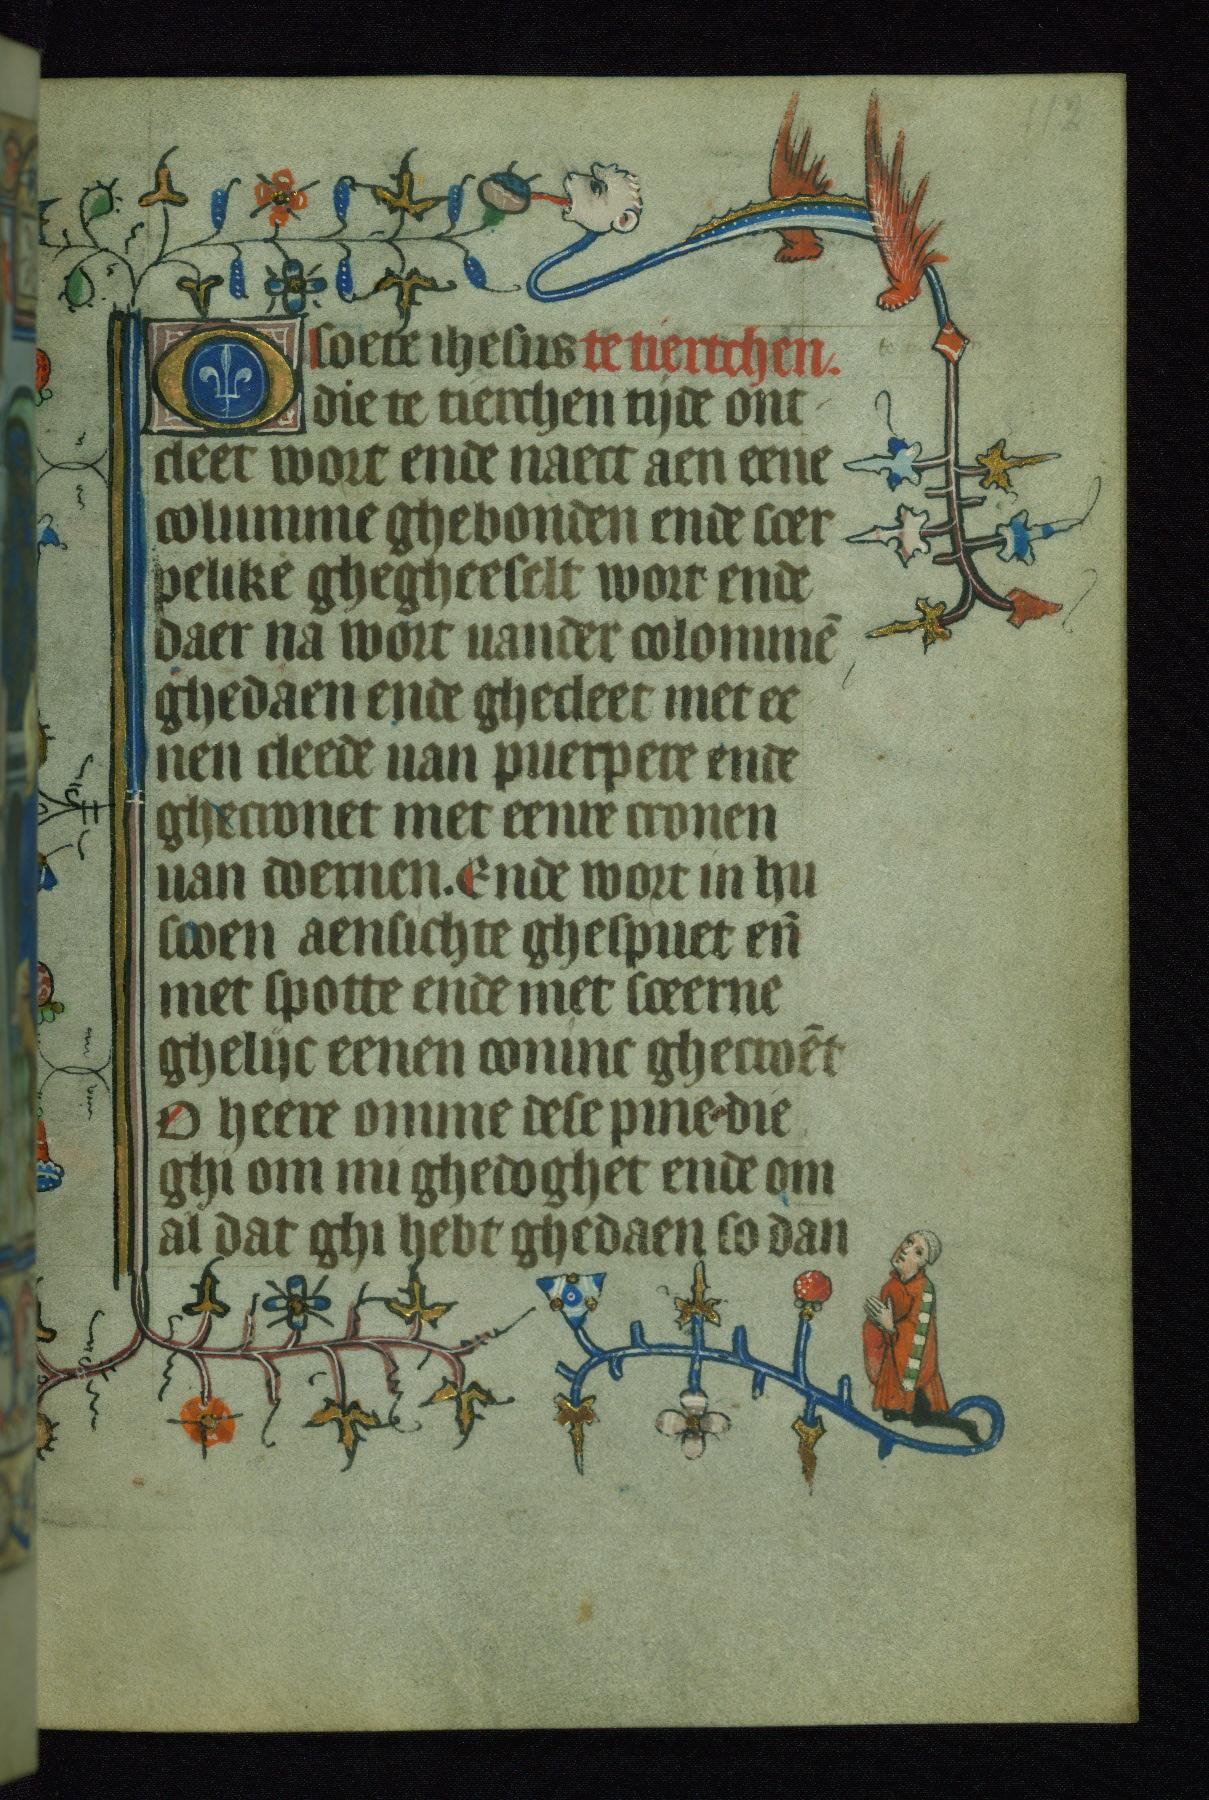 1420‒30 Book of Hours of Daniel RymWalters Ms. W.166 fol 112r